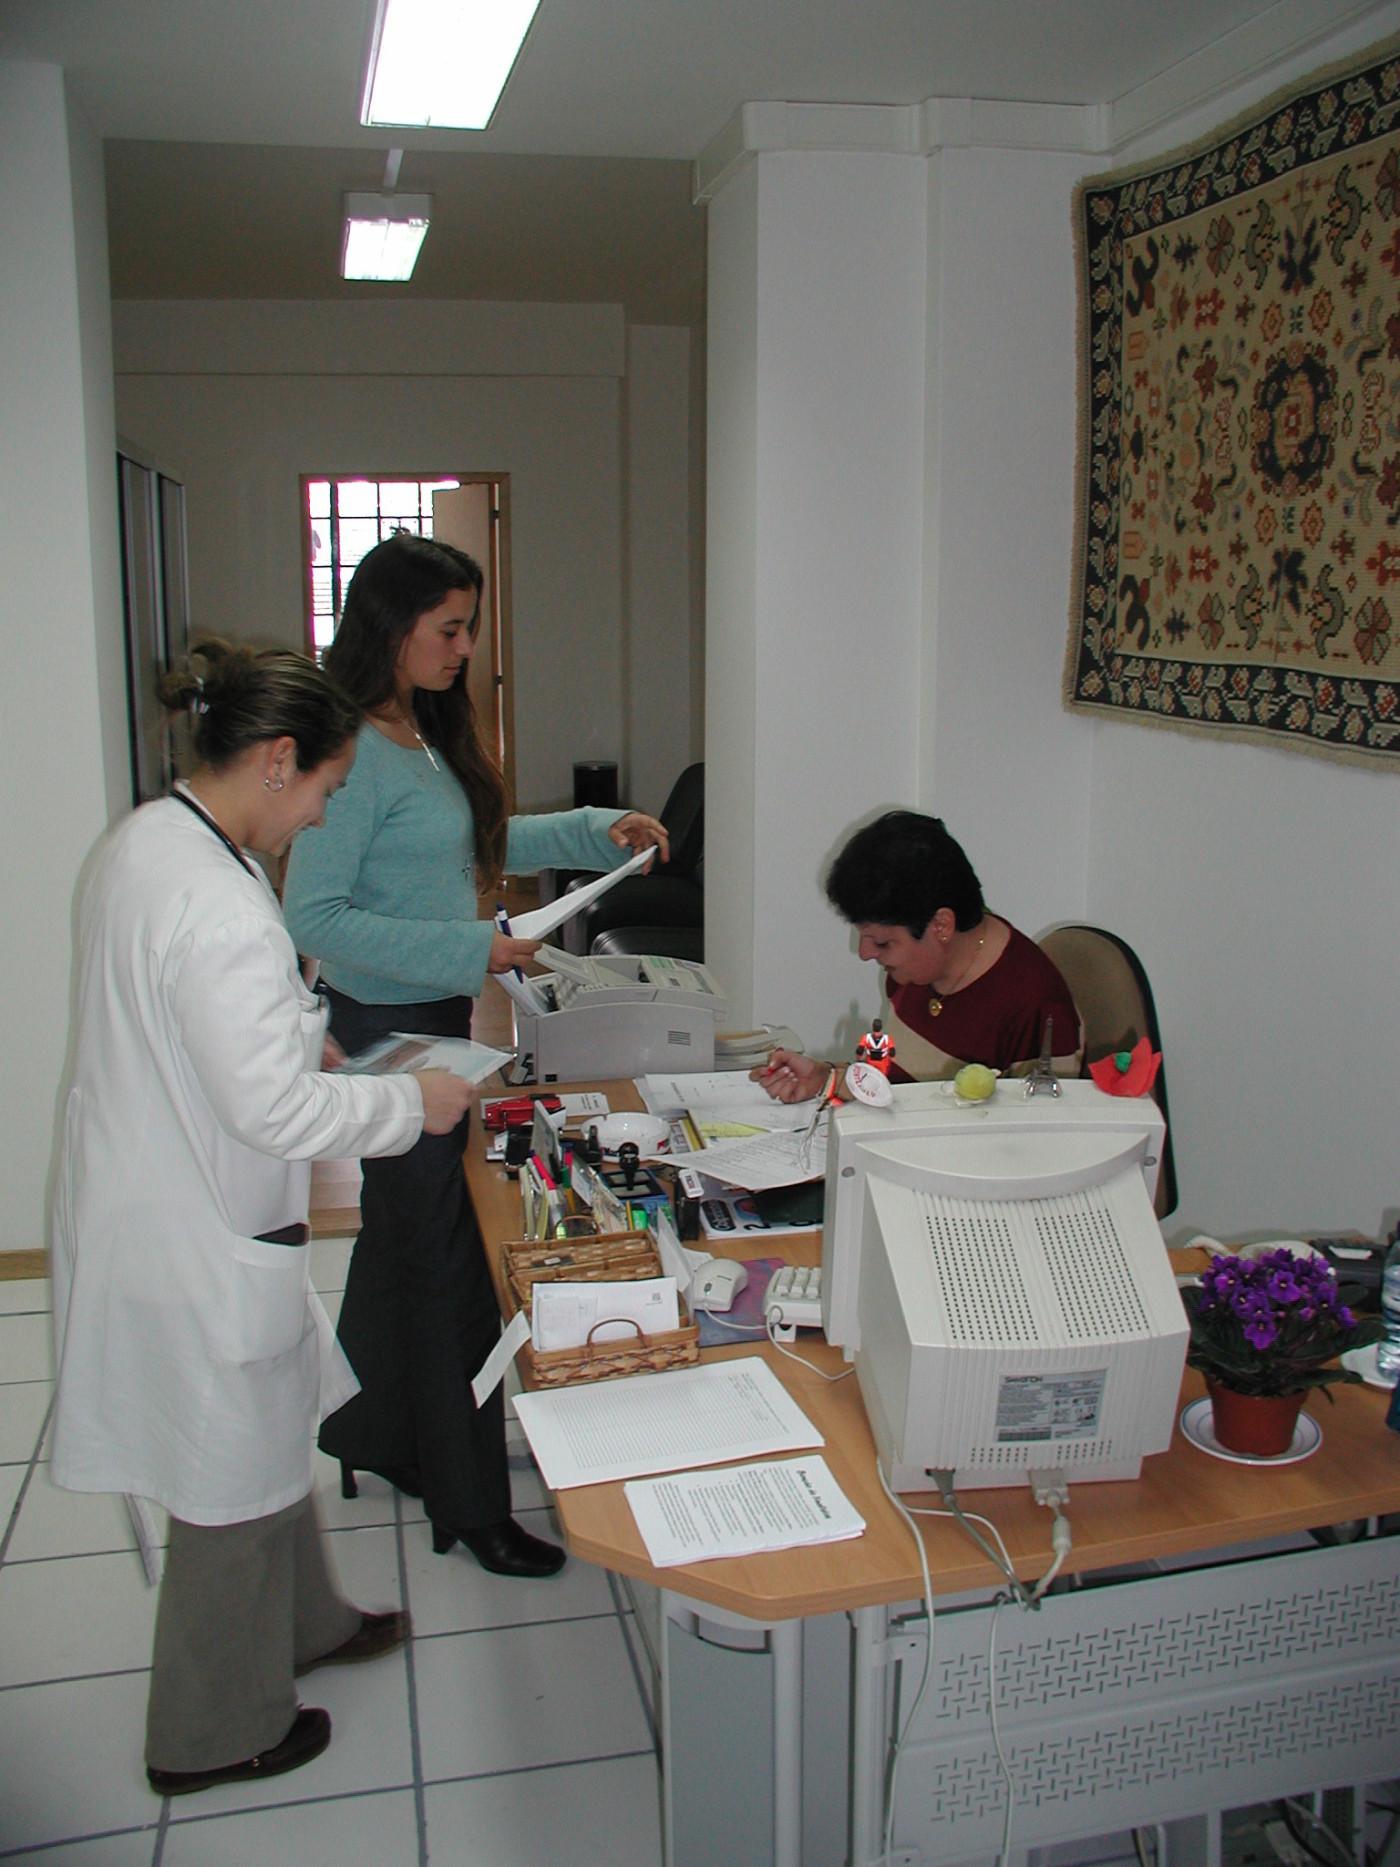 20-03-gabinete-de-secretariado-aefml-2002.jpg